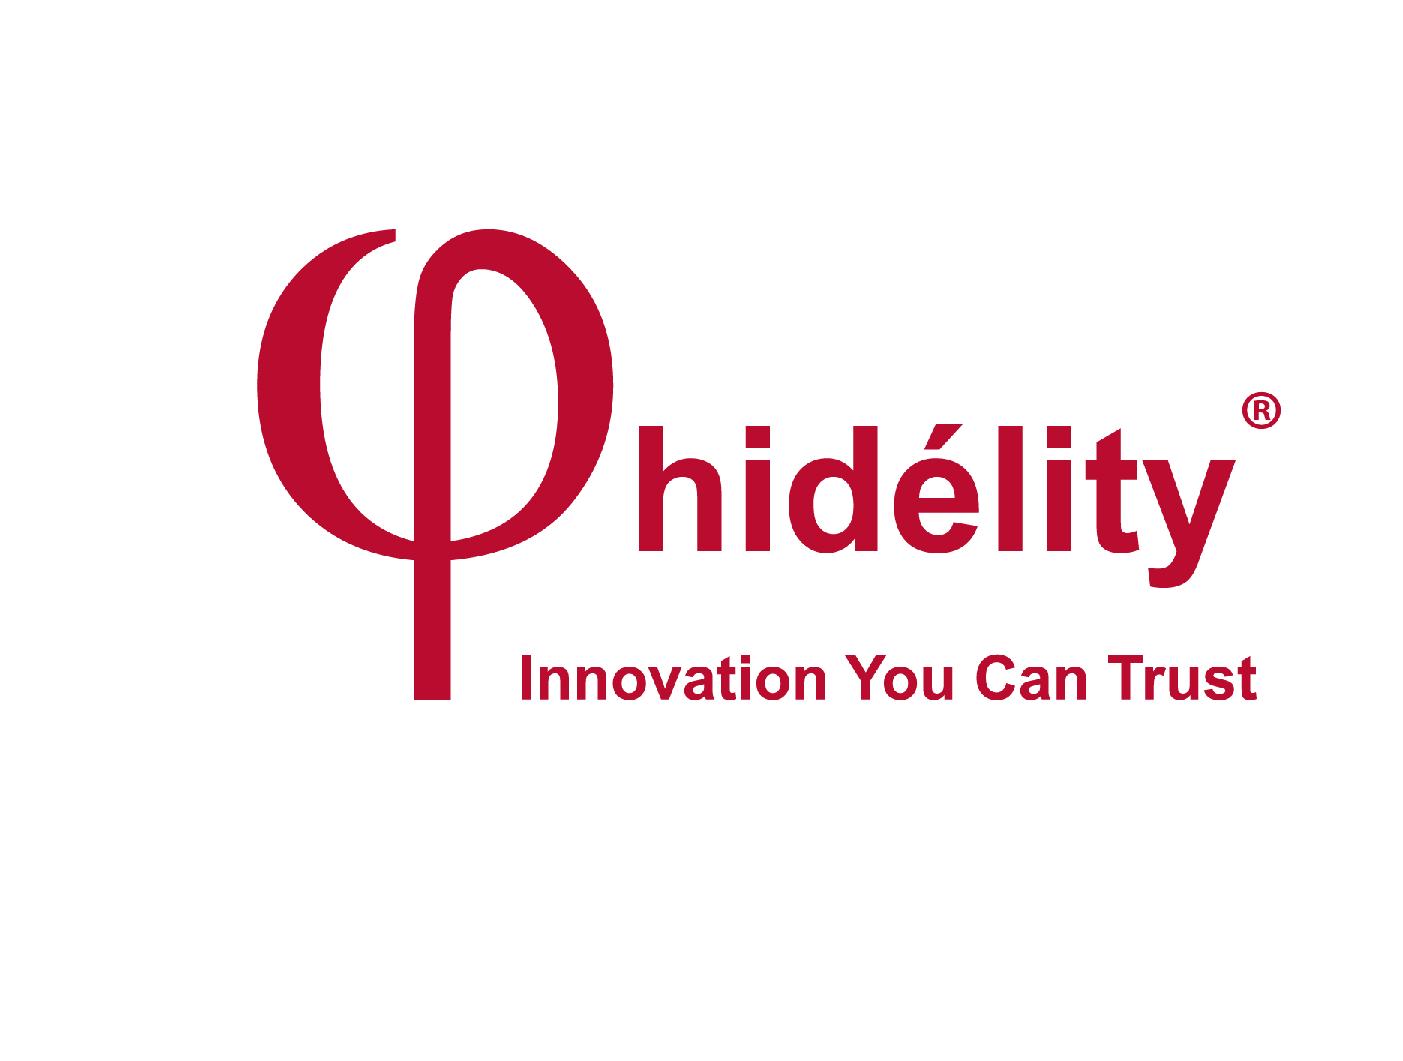 Phidelity_RGB_R - Copy.png